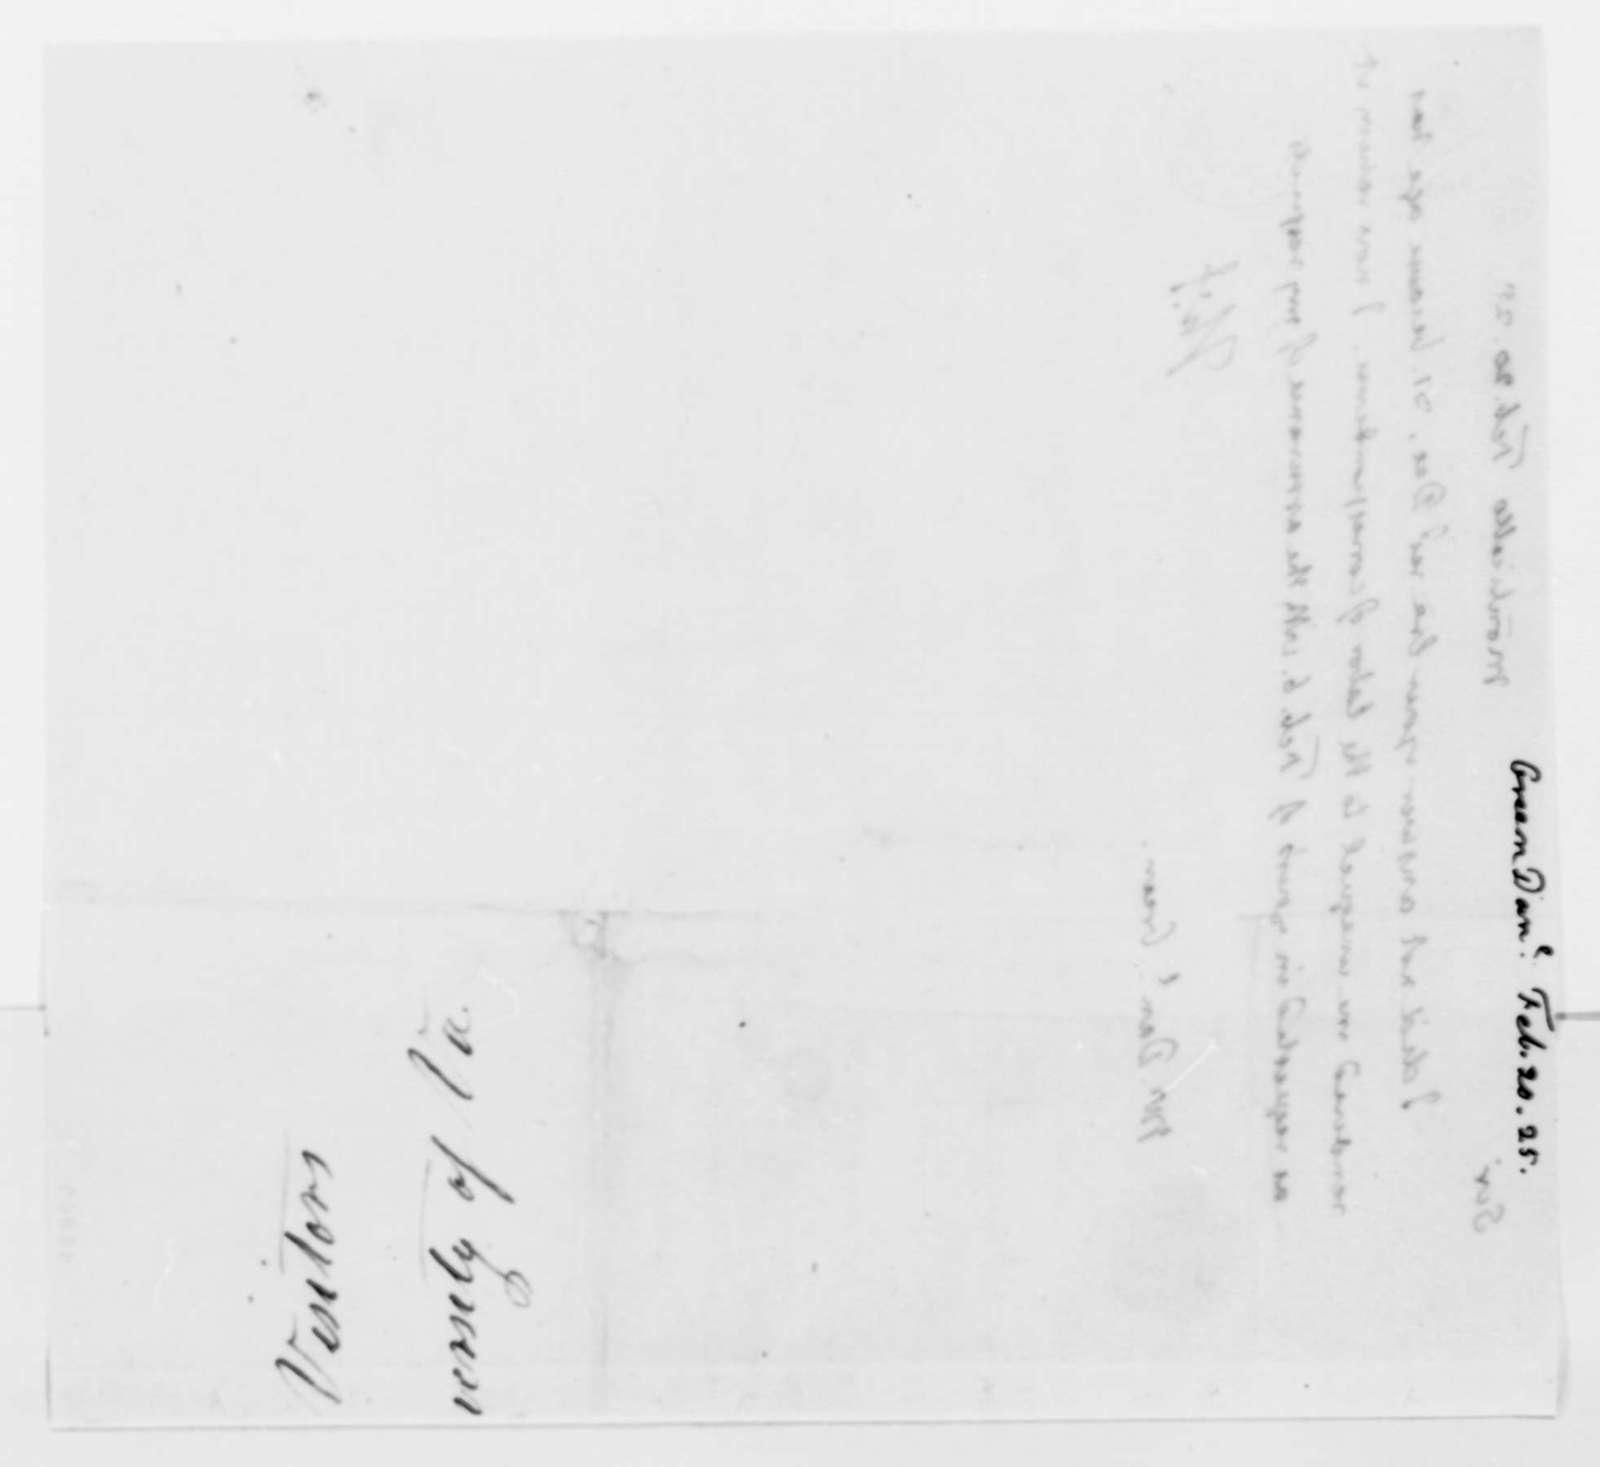 Thomas Jefferson to Daniel L. Green, February 20, 1825